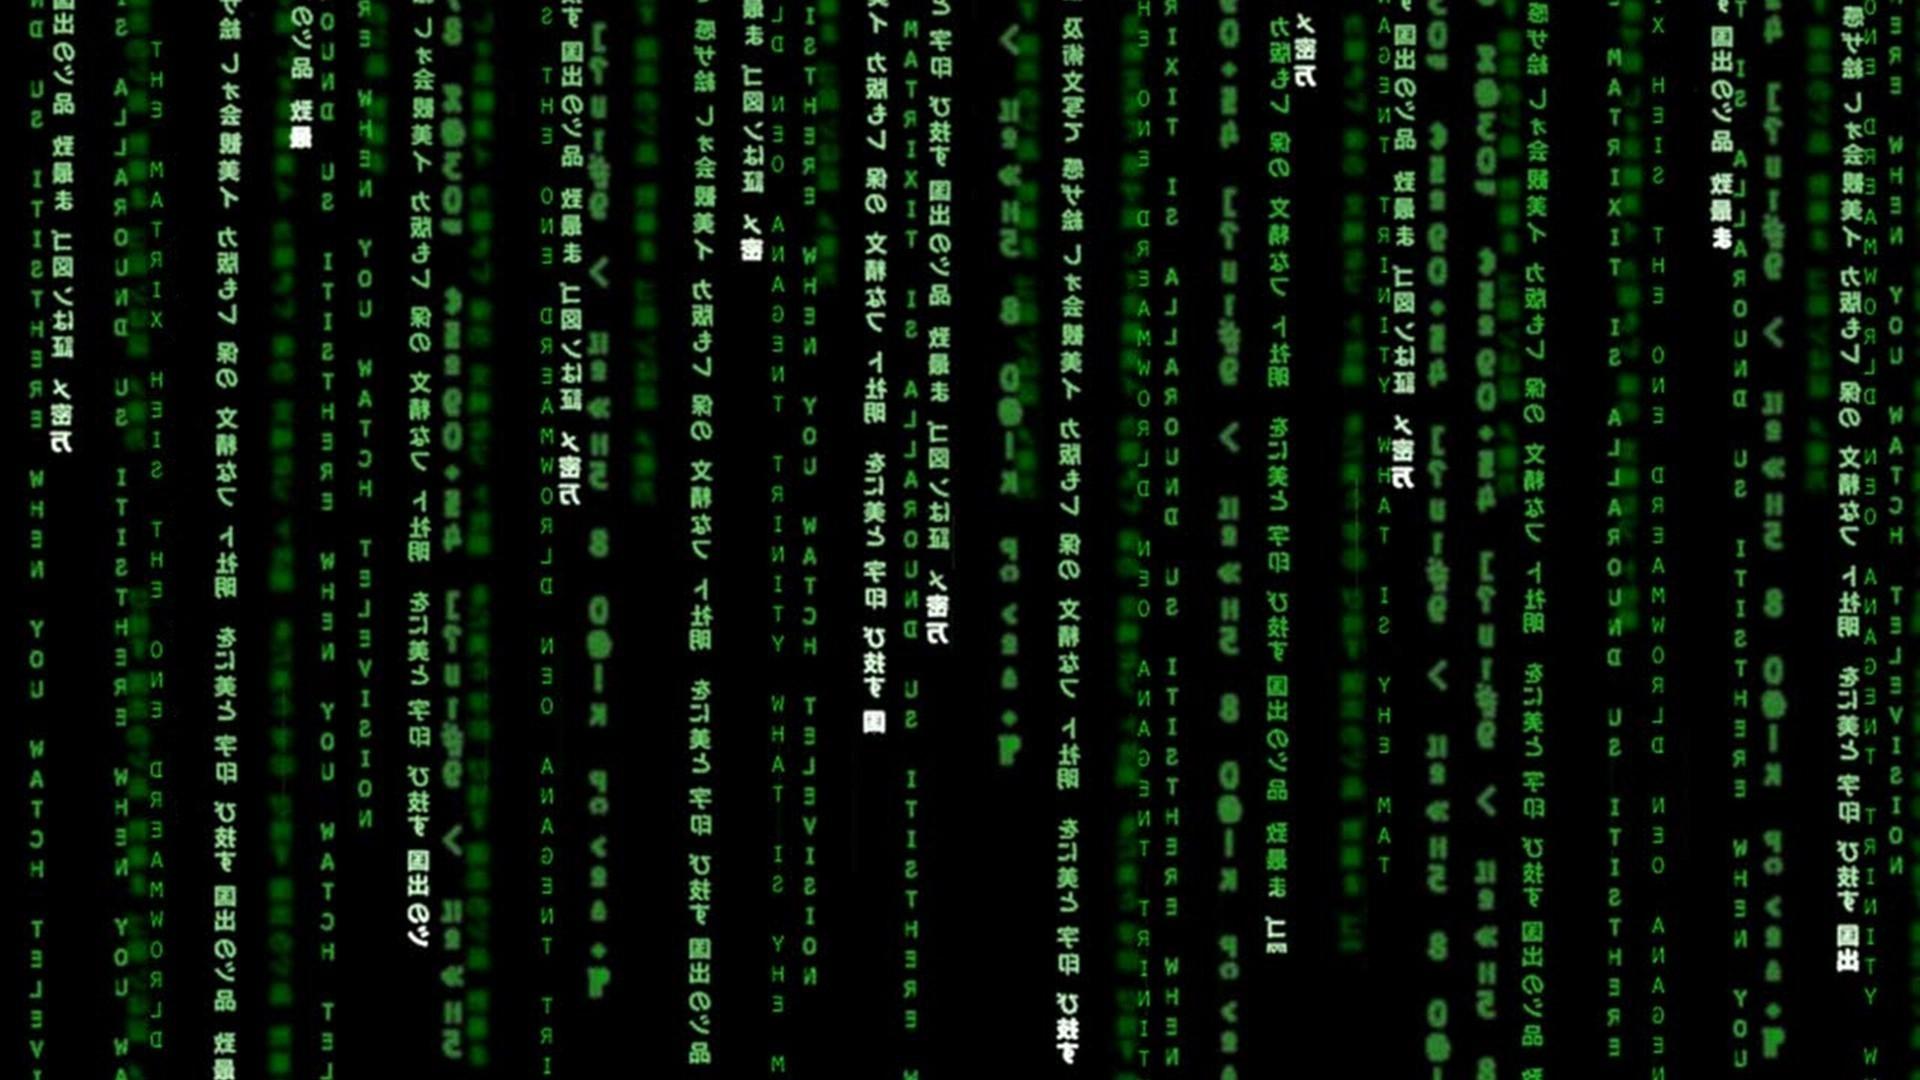 binary wallpaper wallpapersafari - photo #4